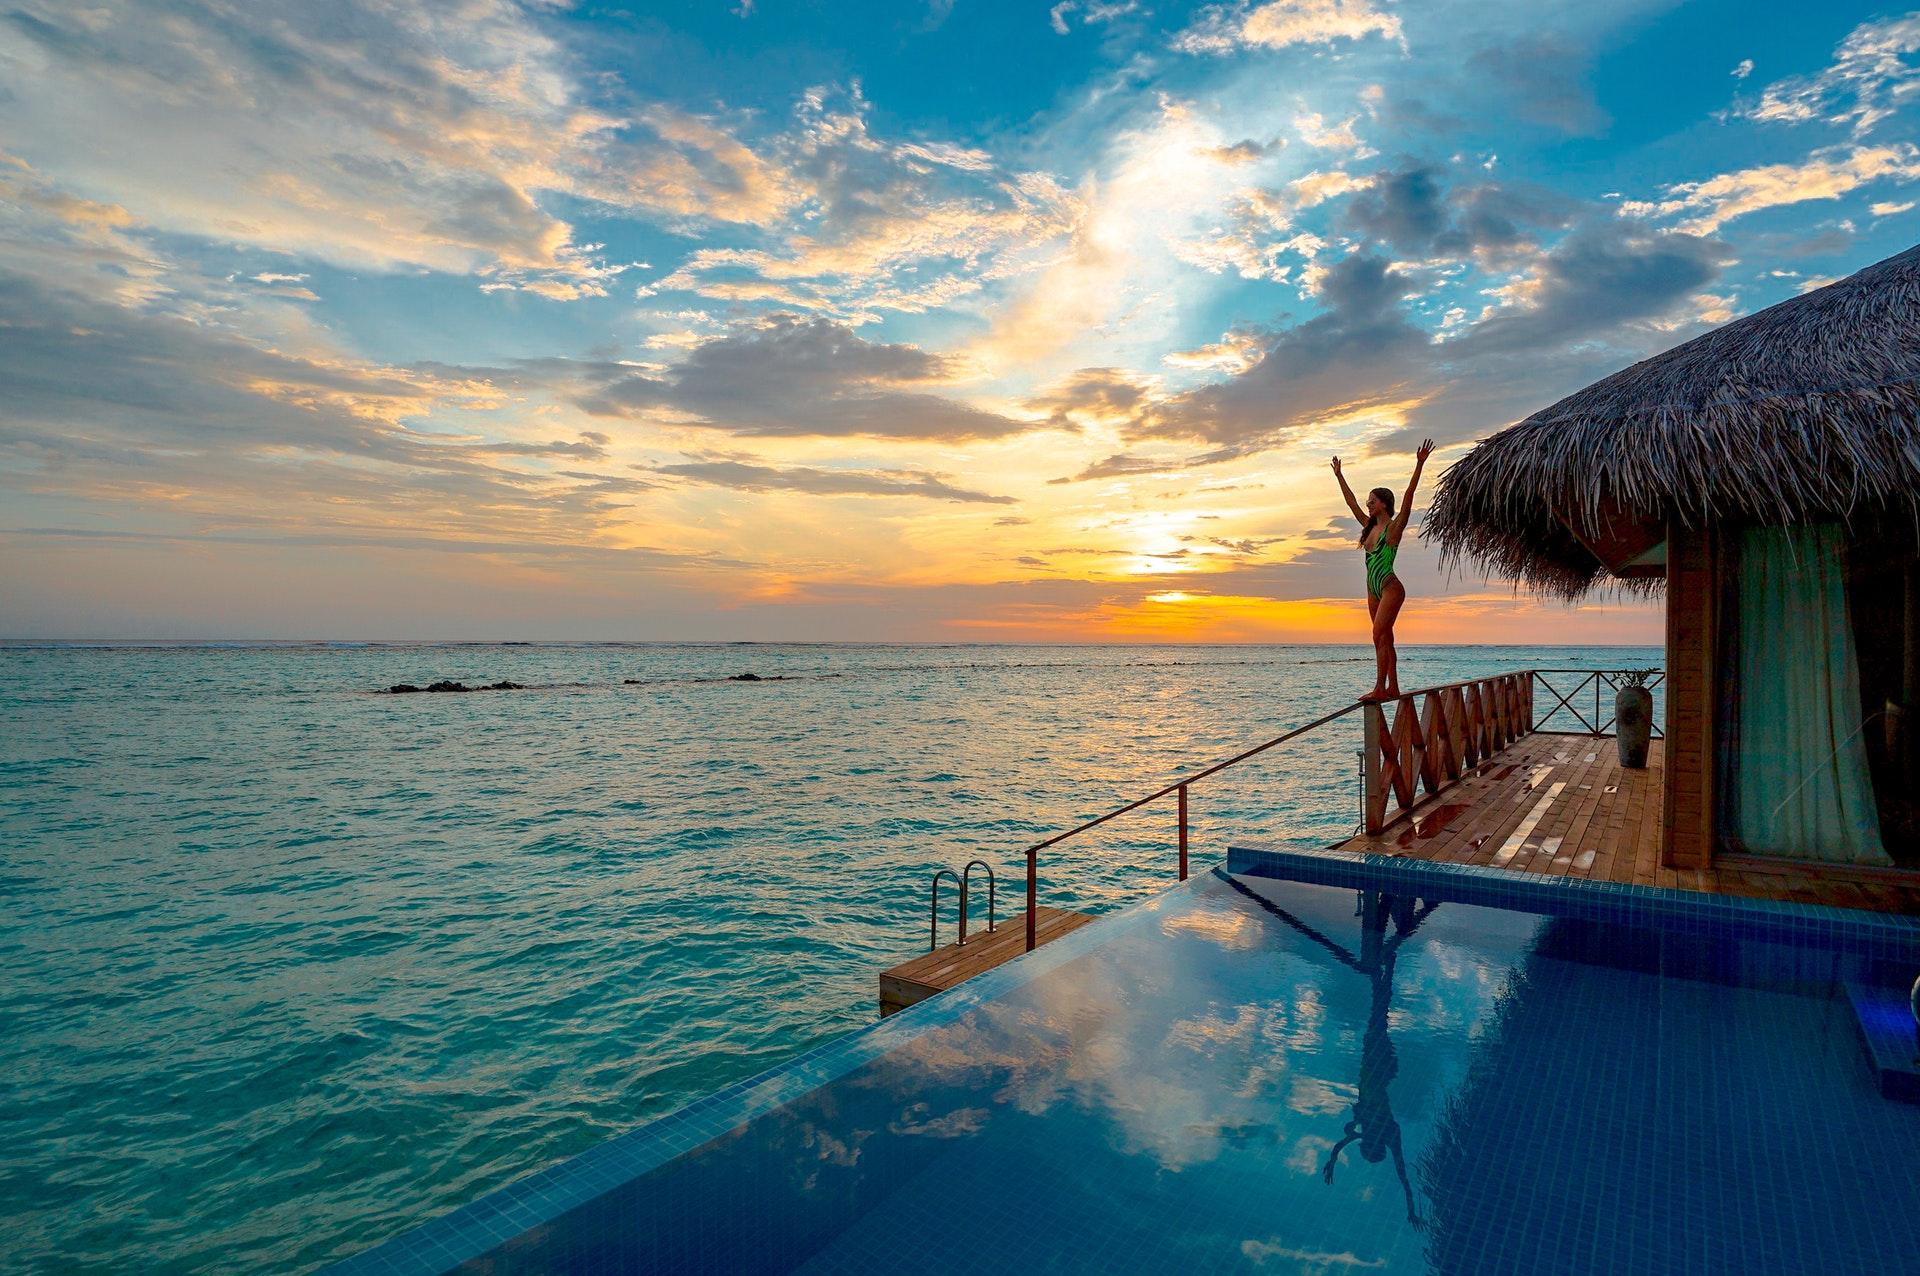 infinity-pool-near-beach-3155666